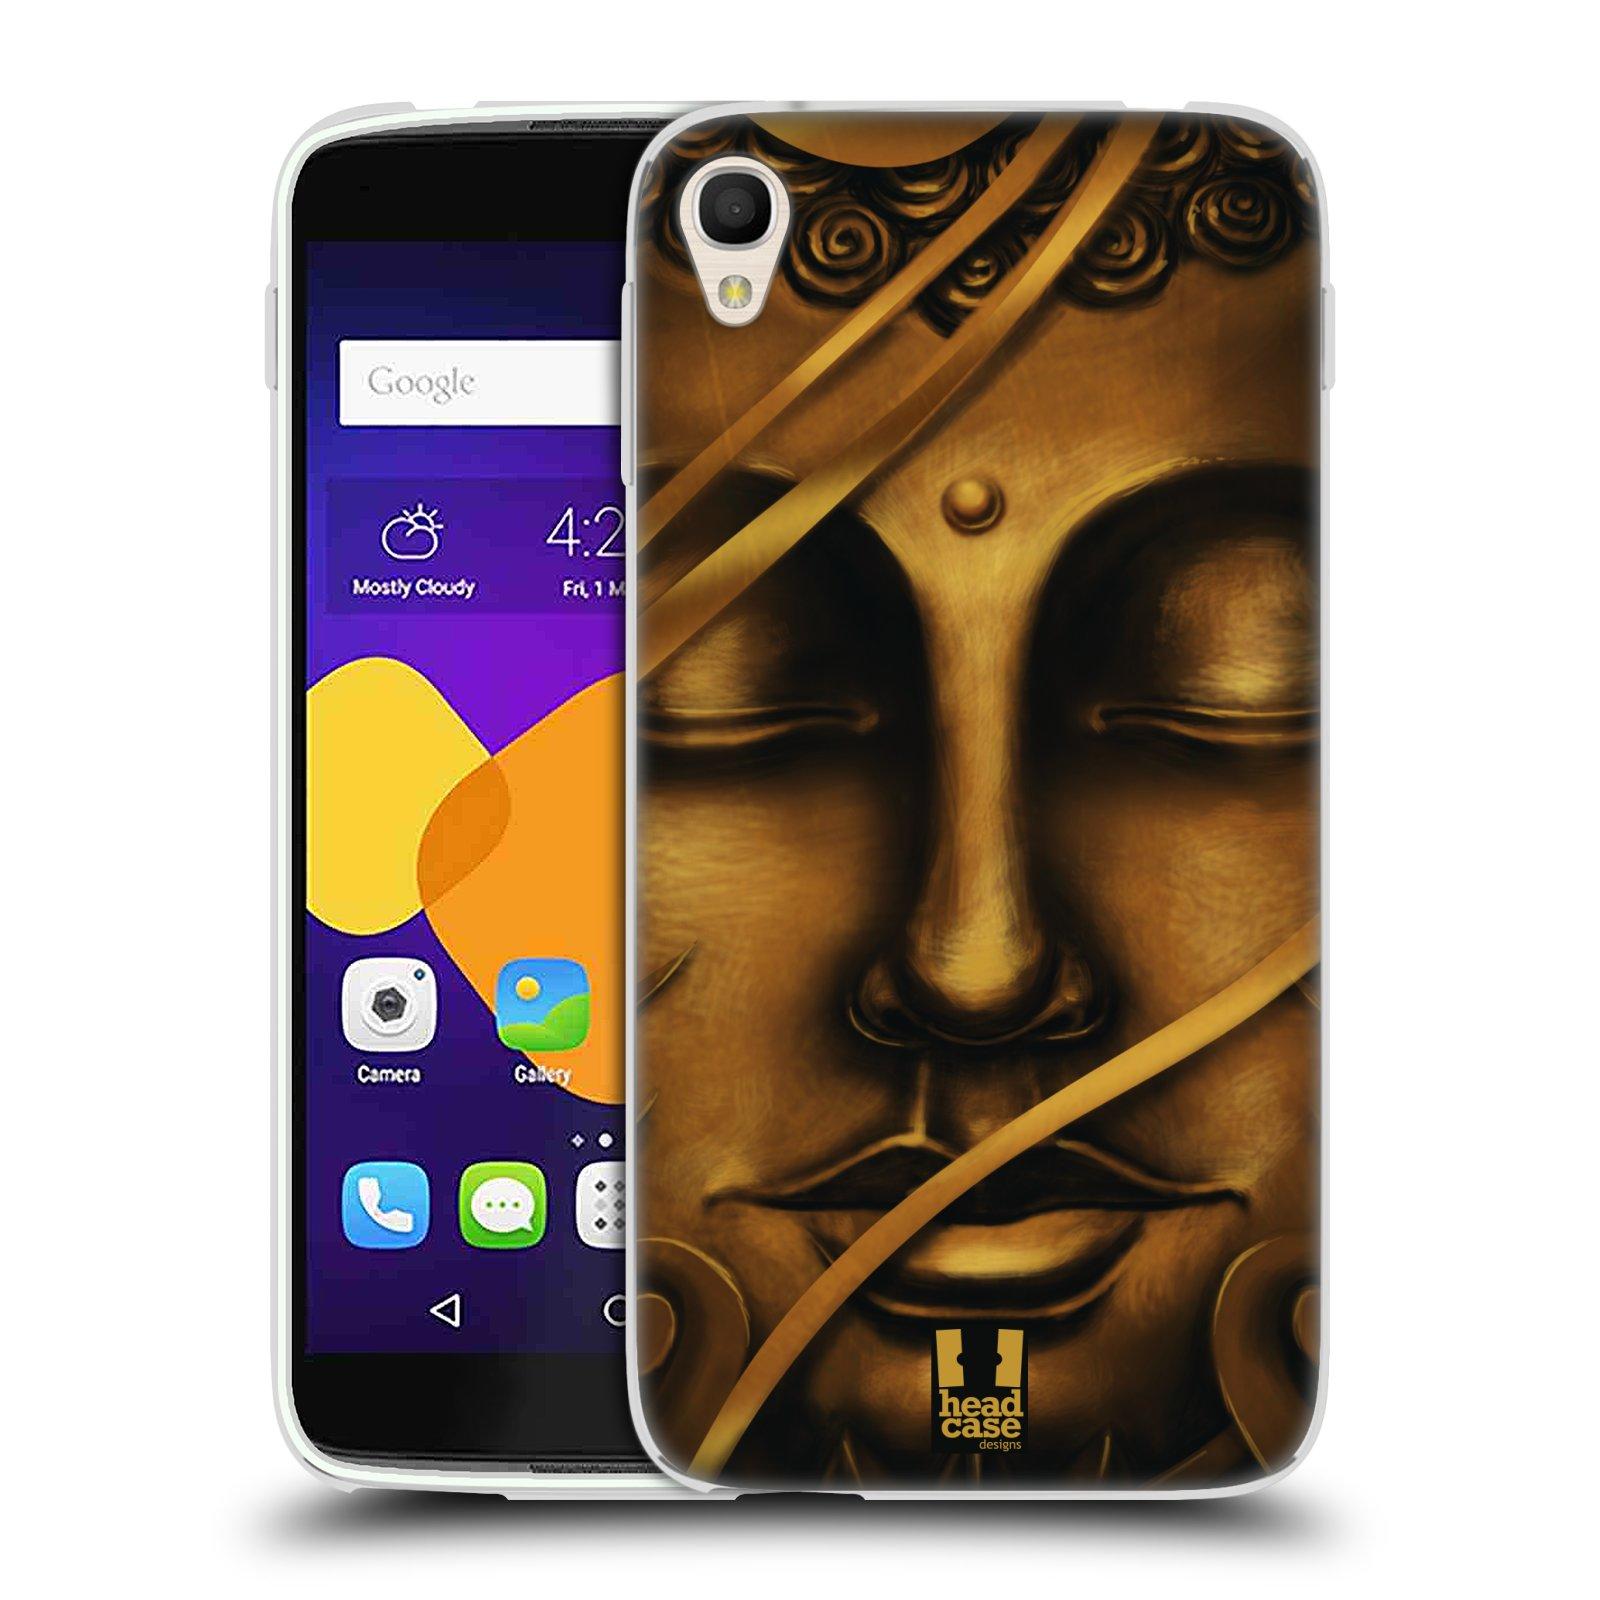 HEAD CASE silikonový obal na mobil Alcatel Idol 3 OT-6045Y (5.5) vzor BUDDHA ZLATÝ BUDHA